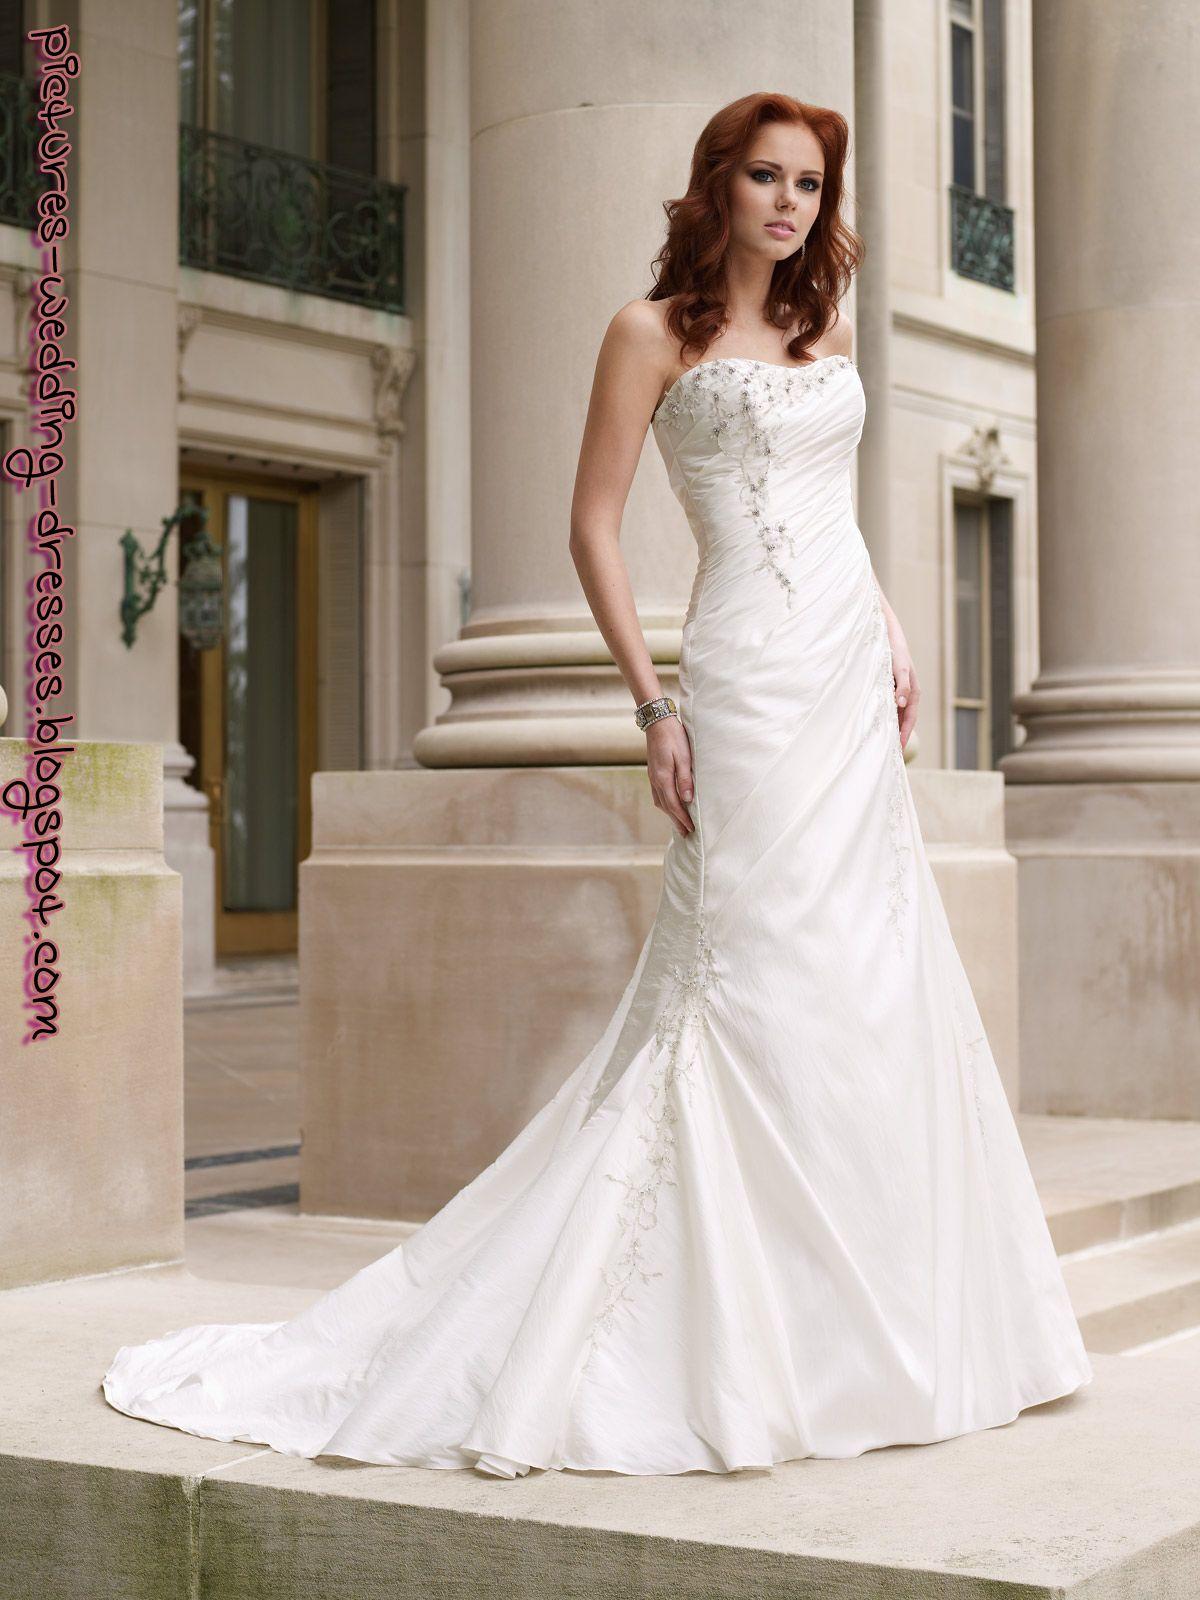 Wedding Gowns Sexy Beauty Modest Dresses Winter Wedding Tips